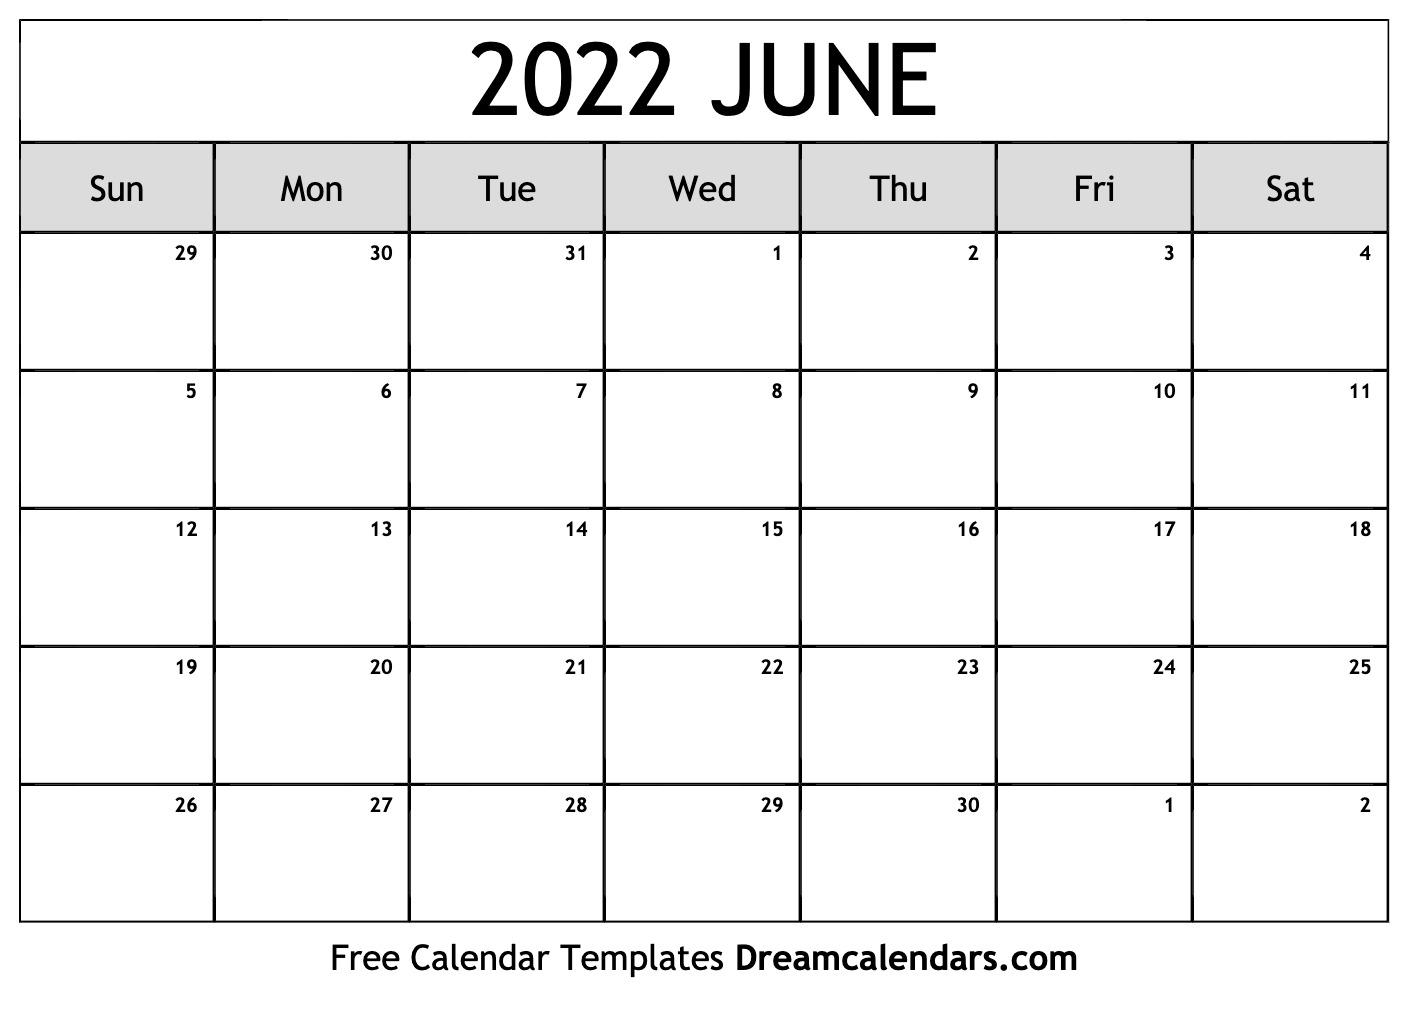 Blank Calendar For June 2022.June 2022 Calendar Free Blank Printable Templates